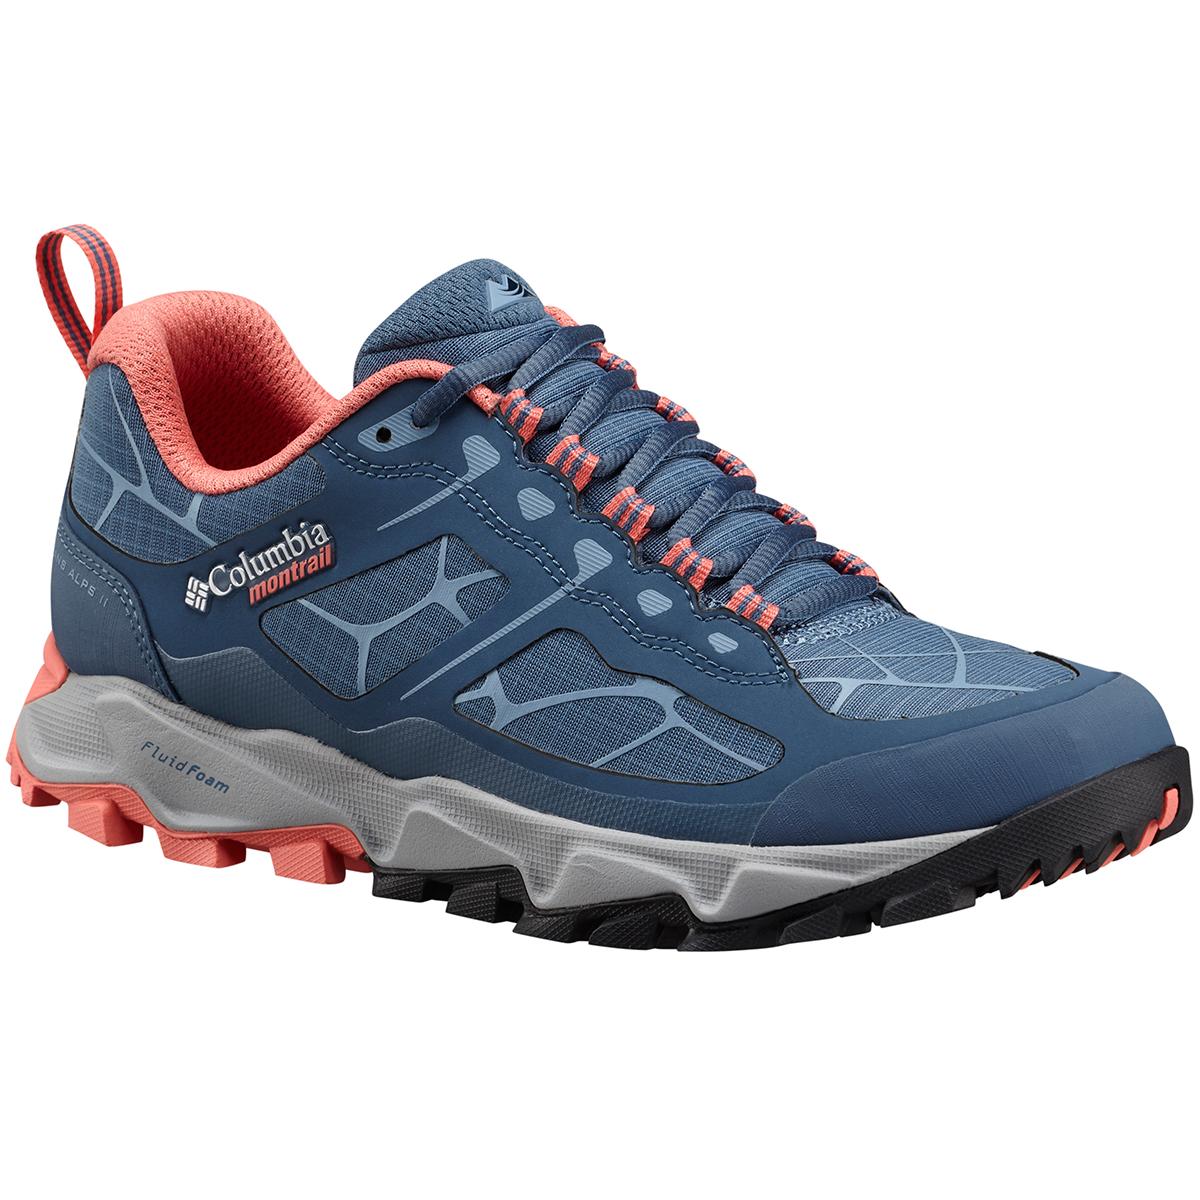 Columbia Women's Trans Alps Ii Trail Running Shoes - Black, 9